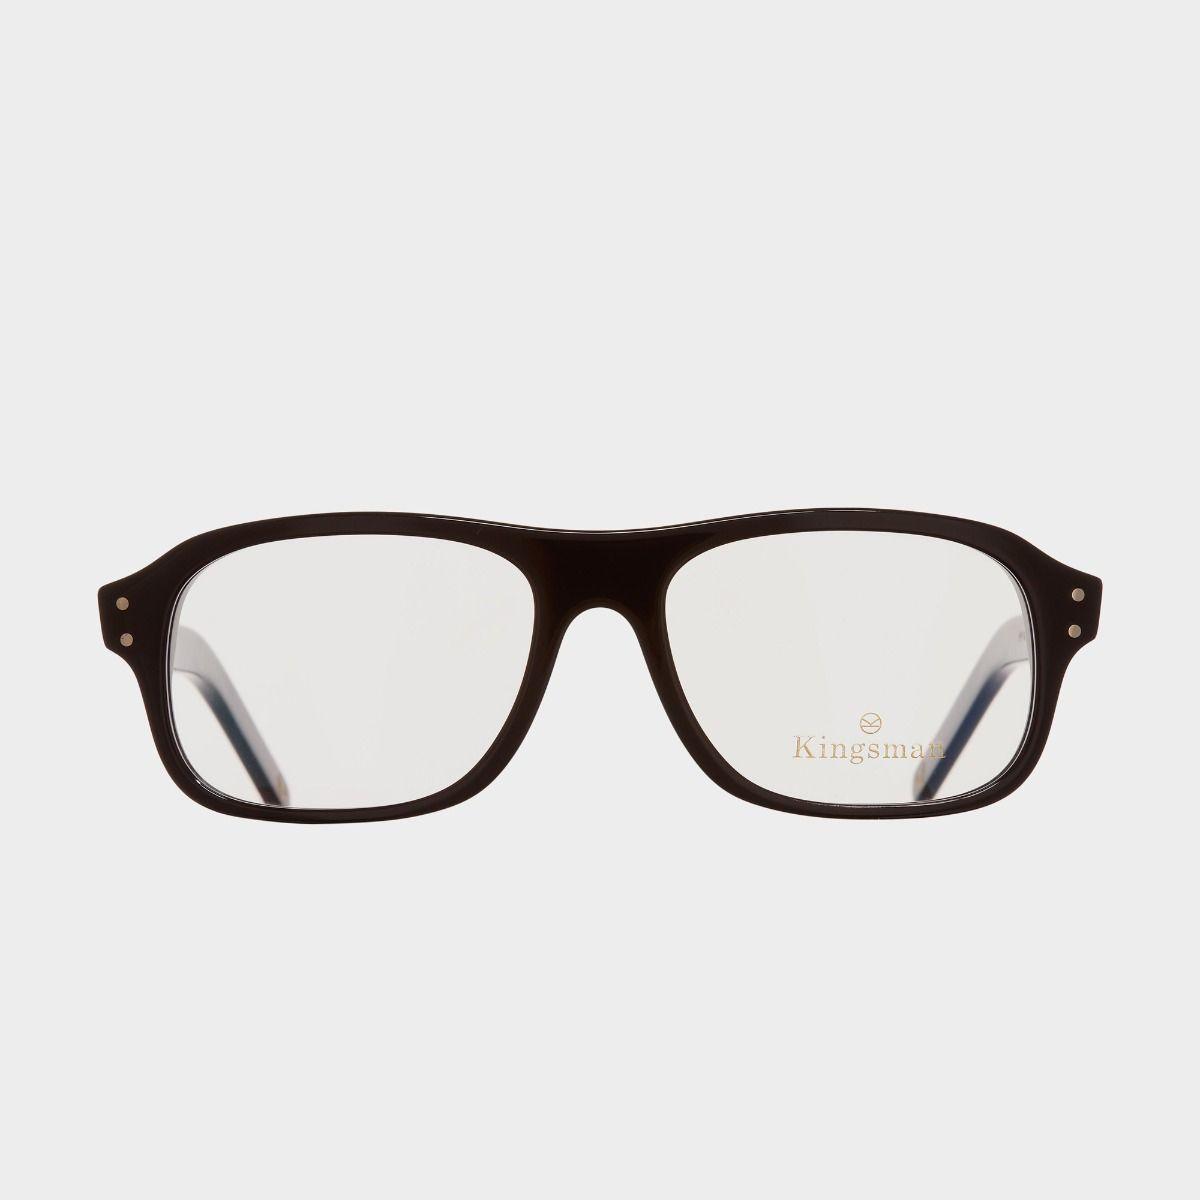 0847 Kingsman Optical Aviator Glasses